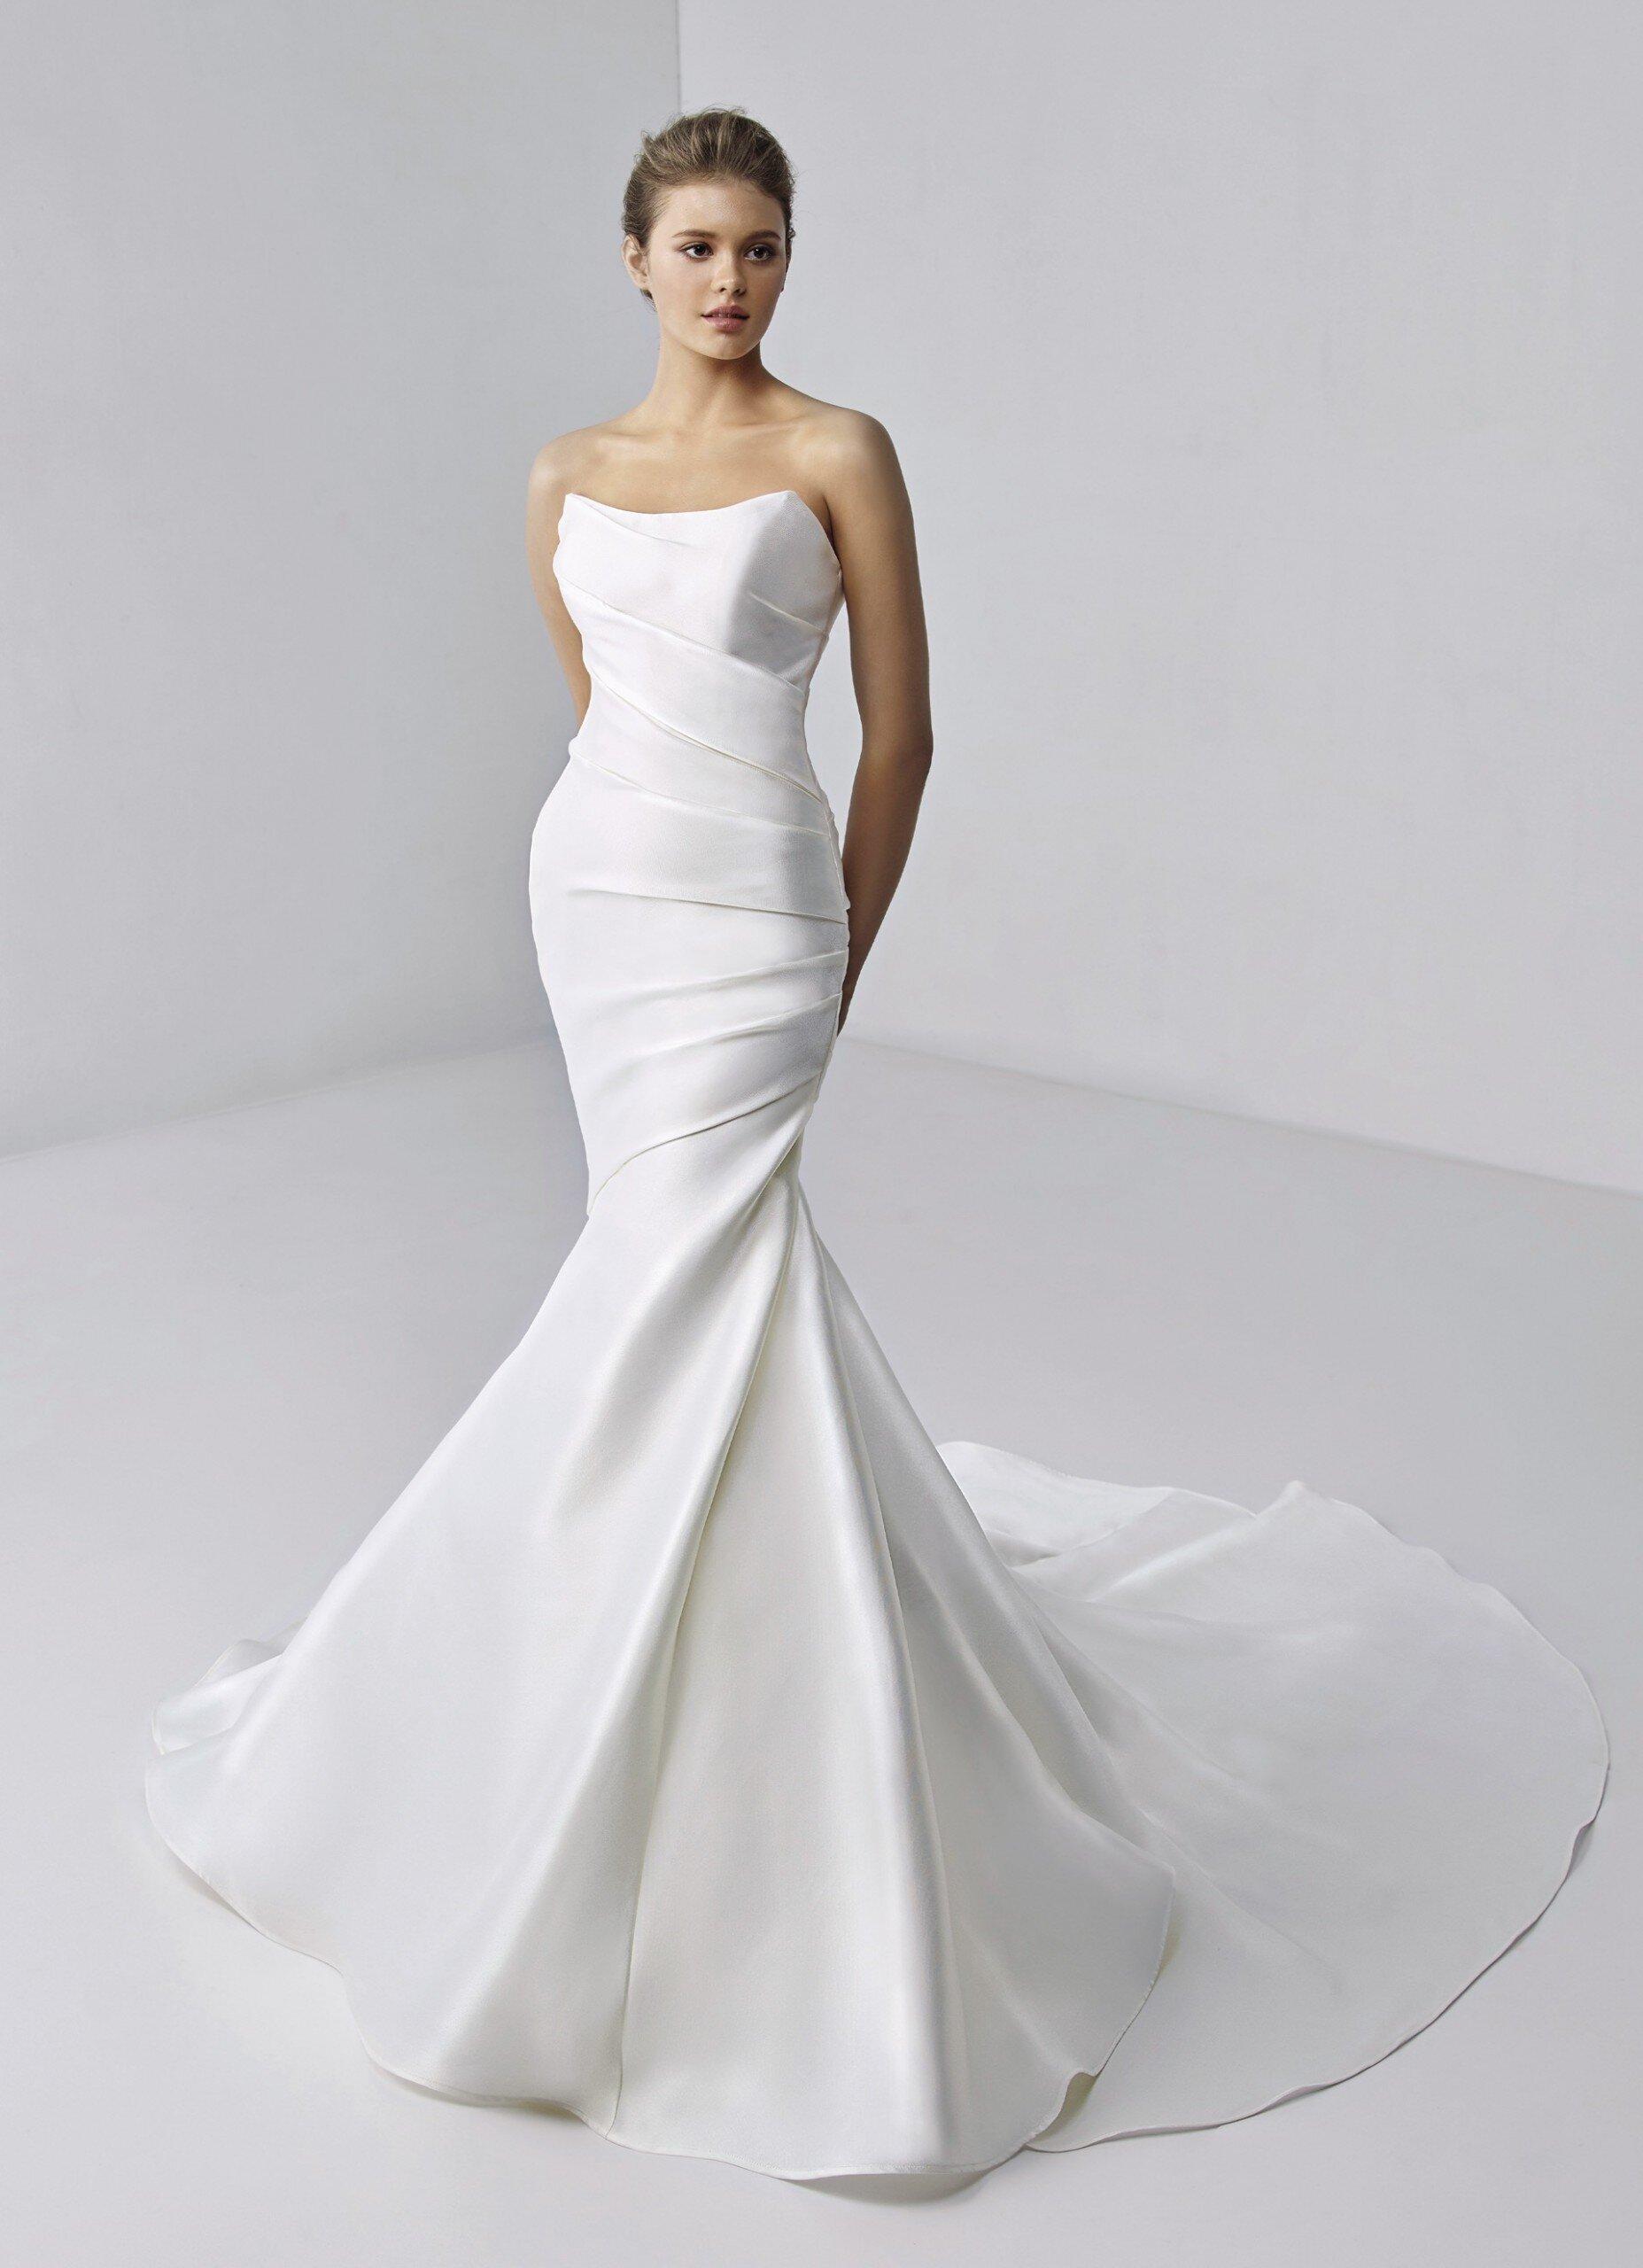 Etoile Brautmode Kollektion 2021 Modell Andromeda